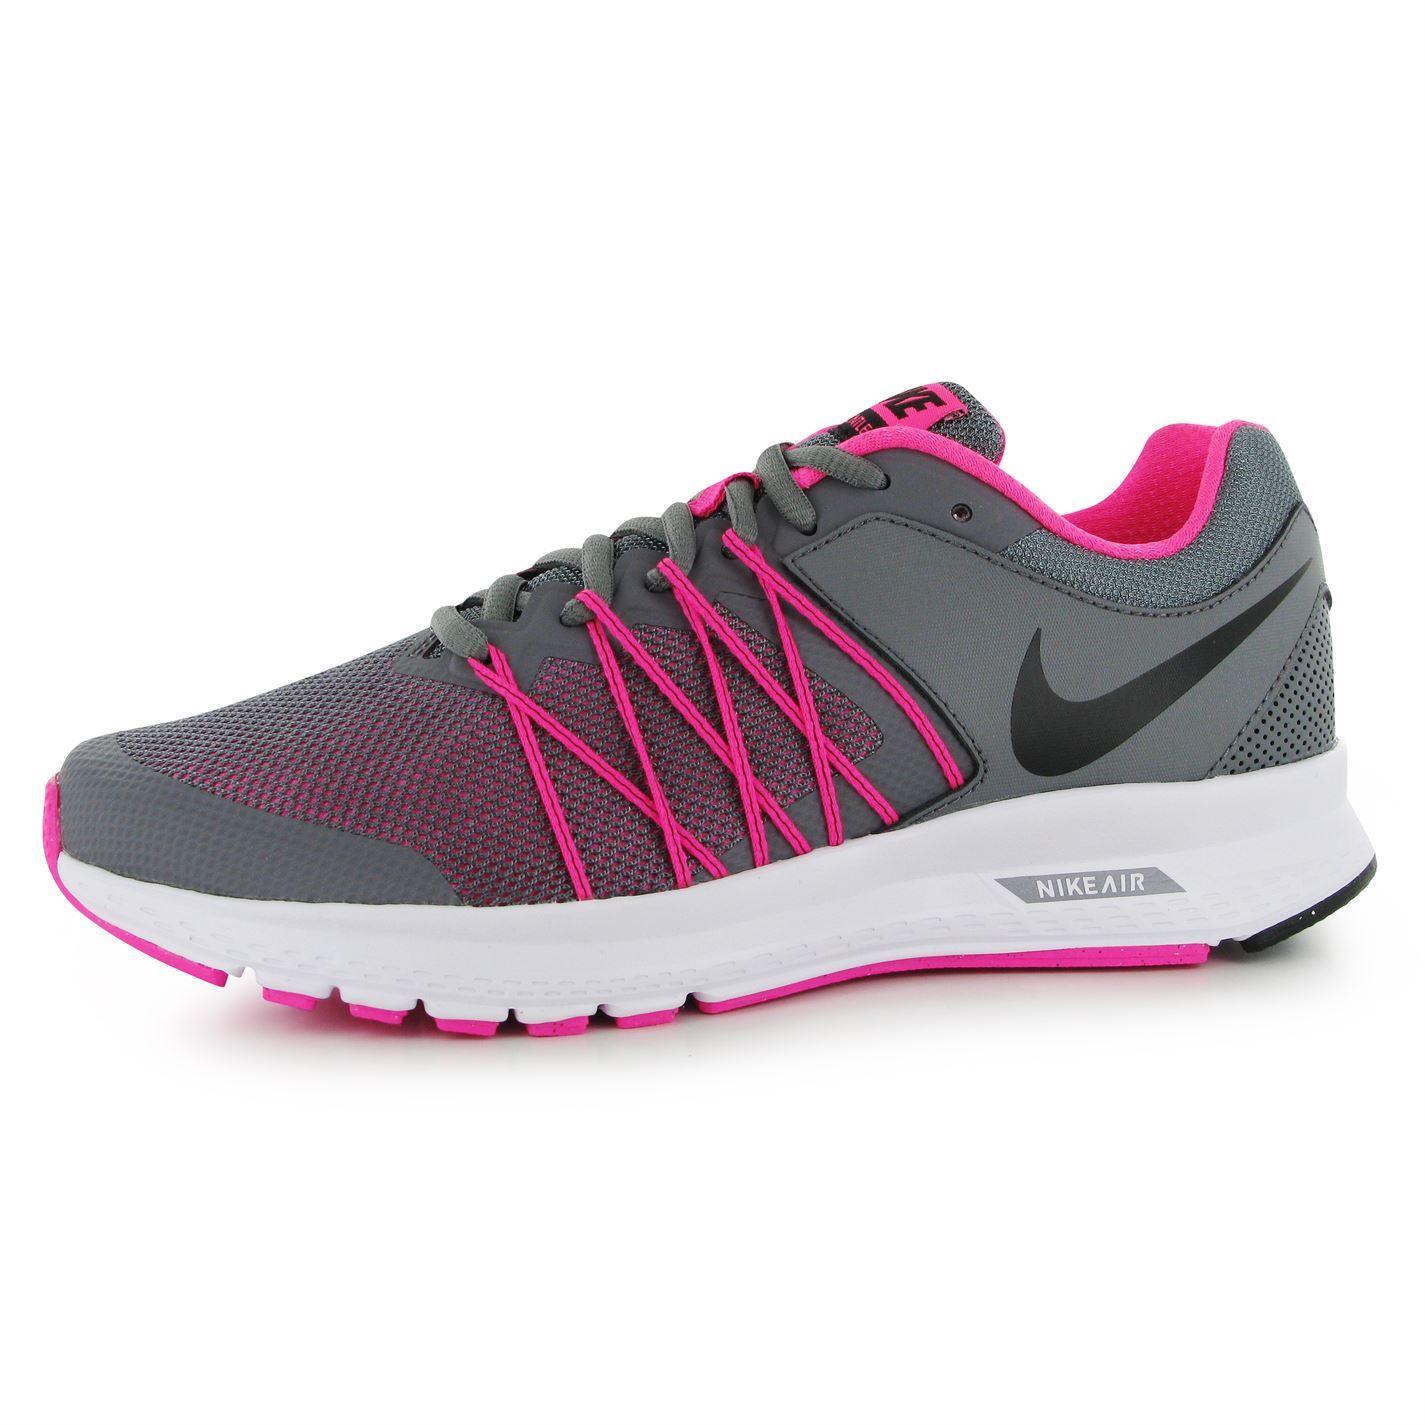 Nike Women 39 S Air Relentless 3 Running Shoes Black White